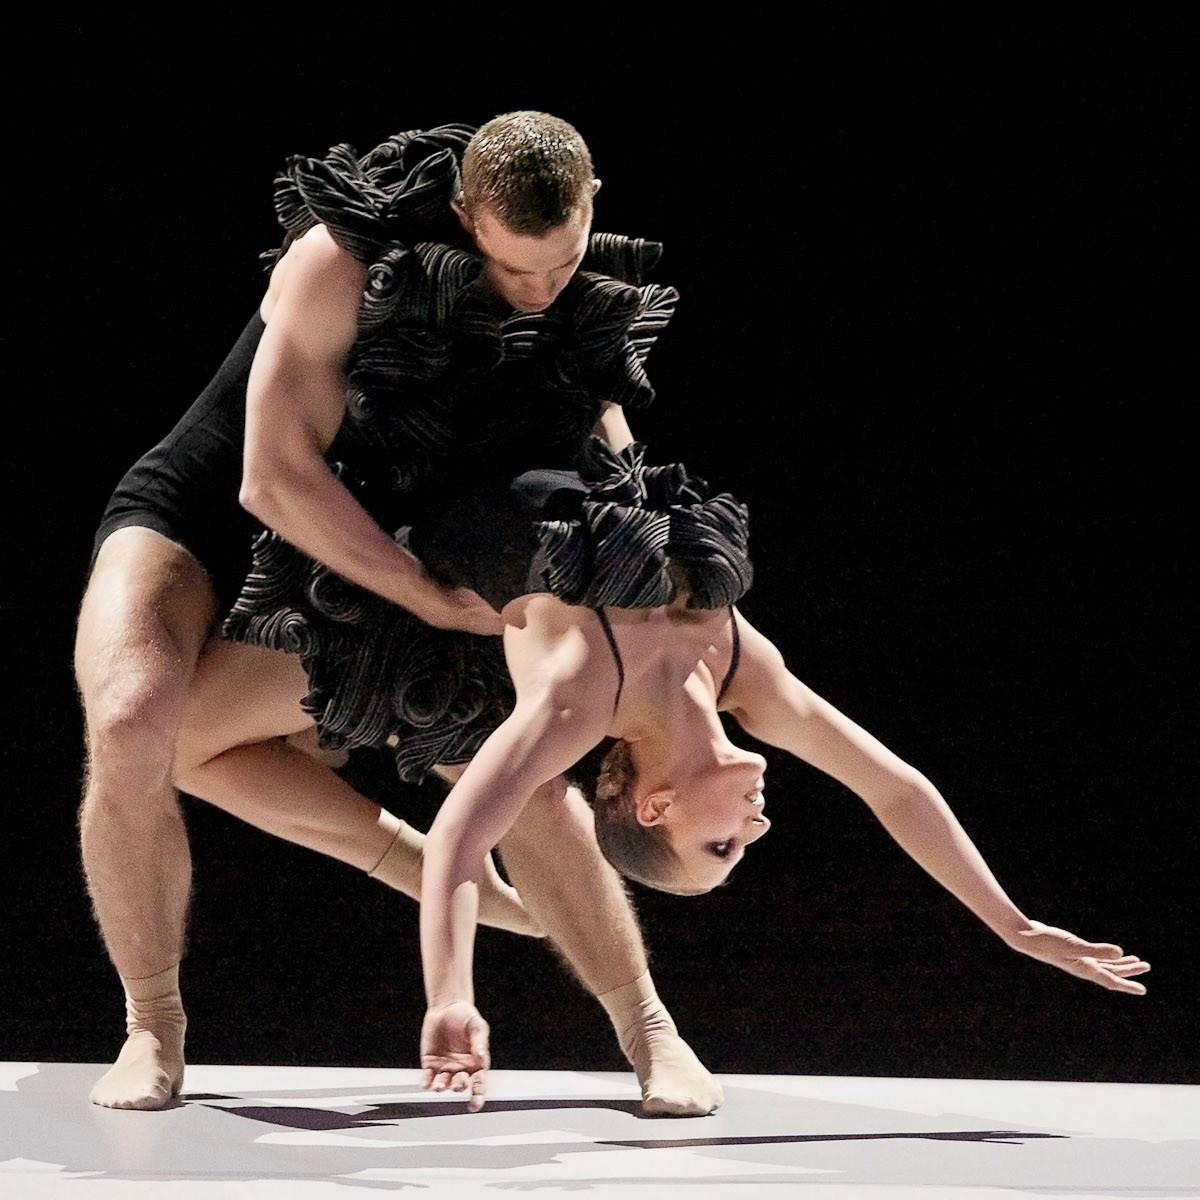 News_Nancy Wozny_Jacob's Pillow_Erik Johansson_Ellah Nagil_The Göteborg Ballet_in OreloB of 3xBoléro